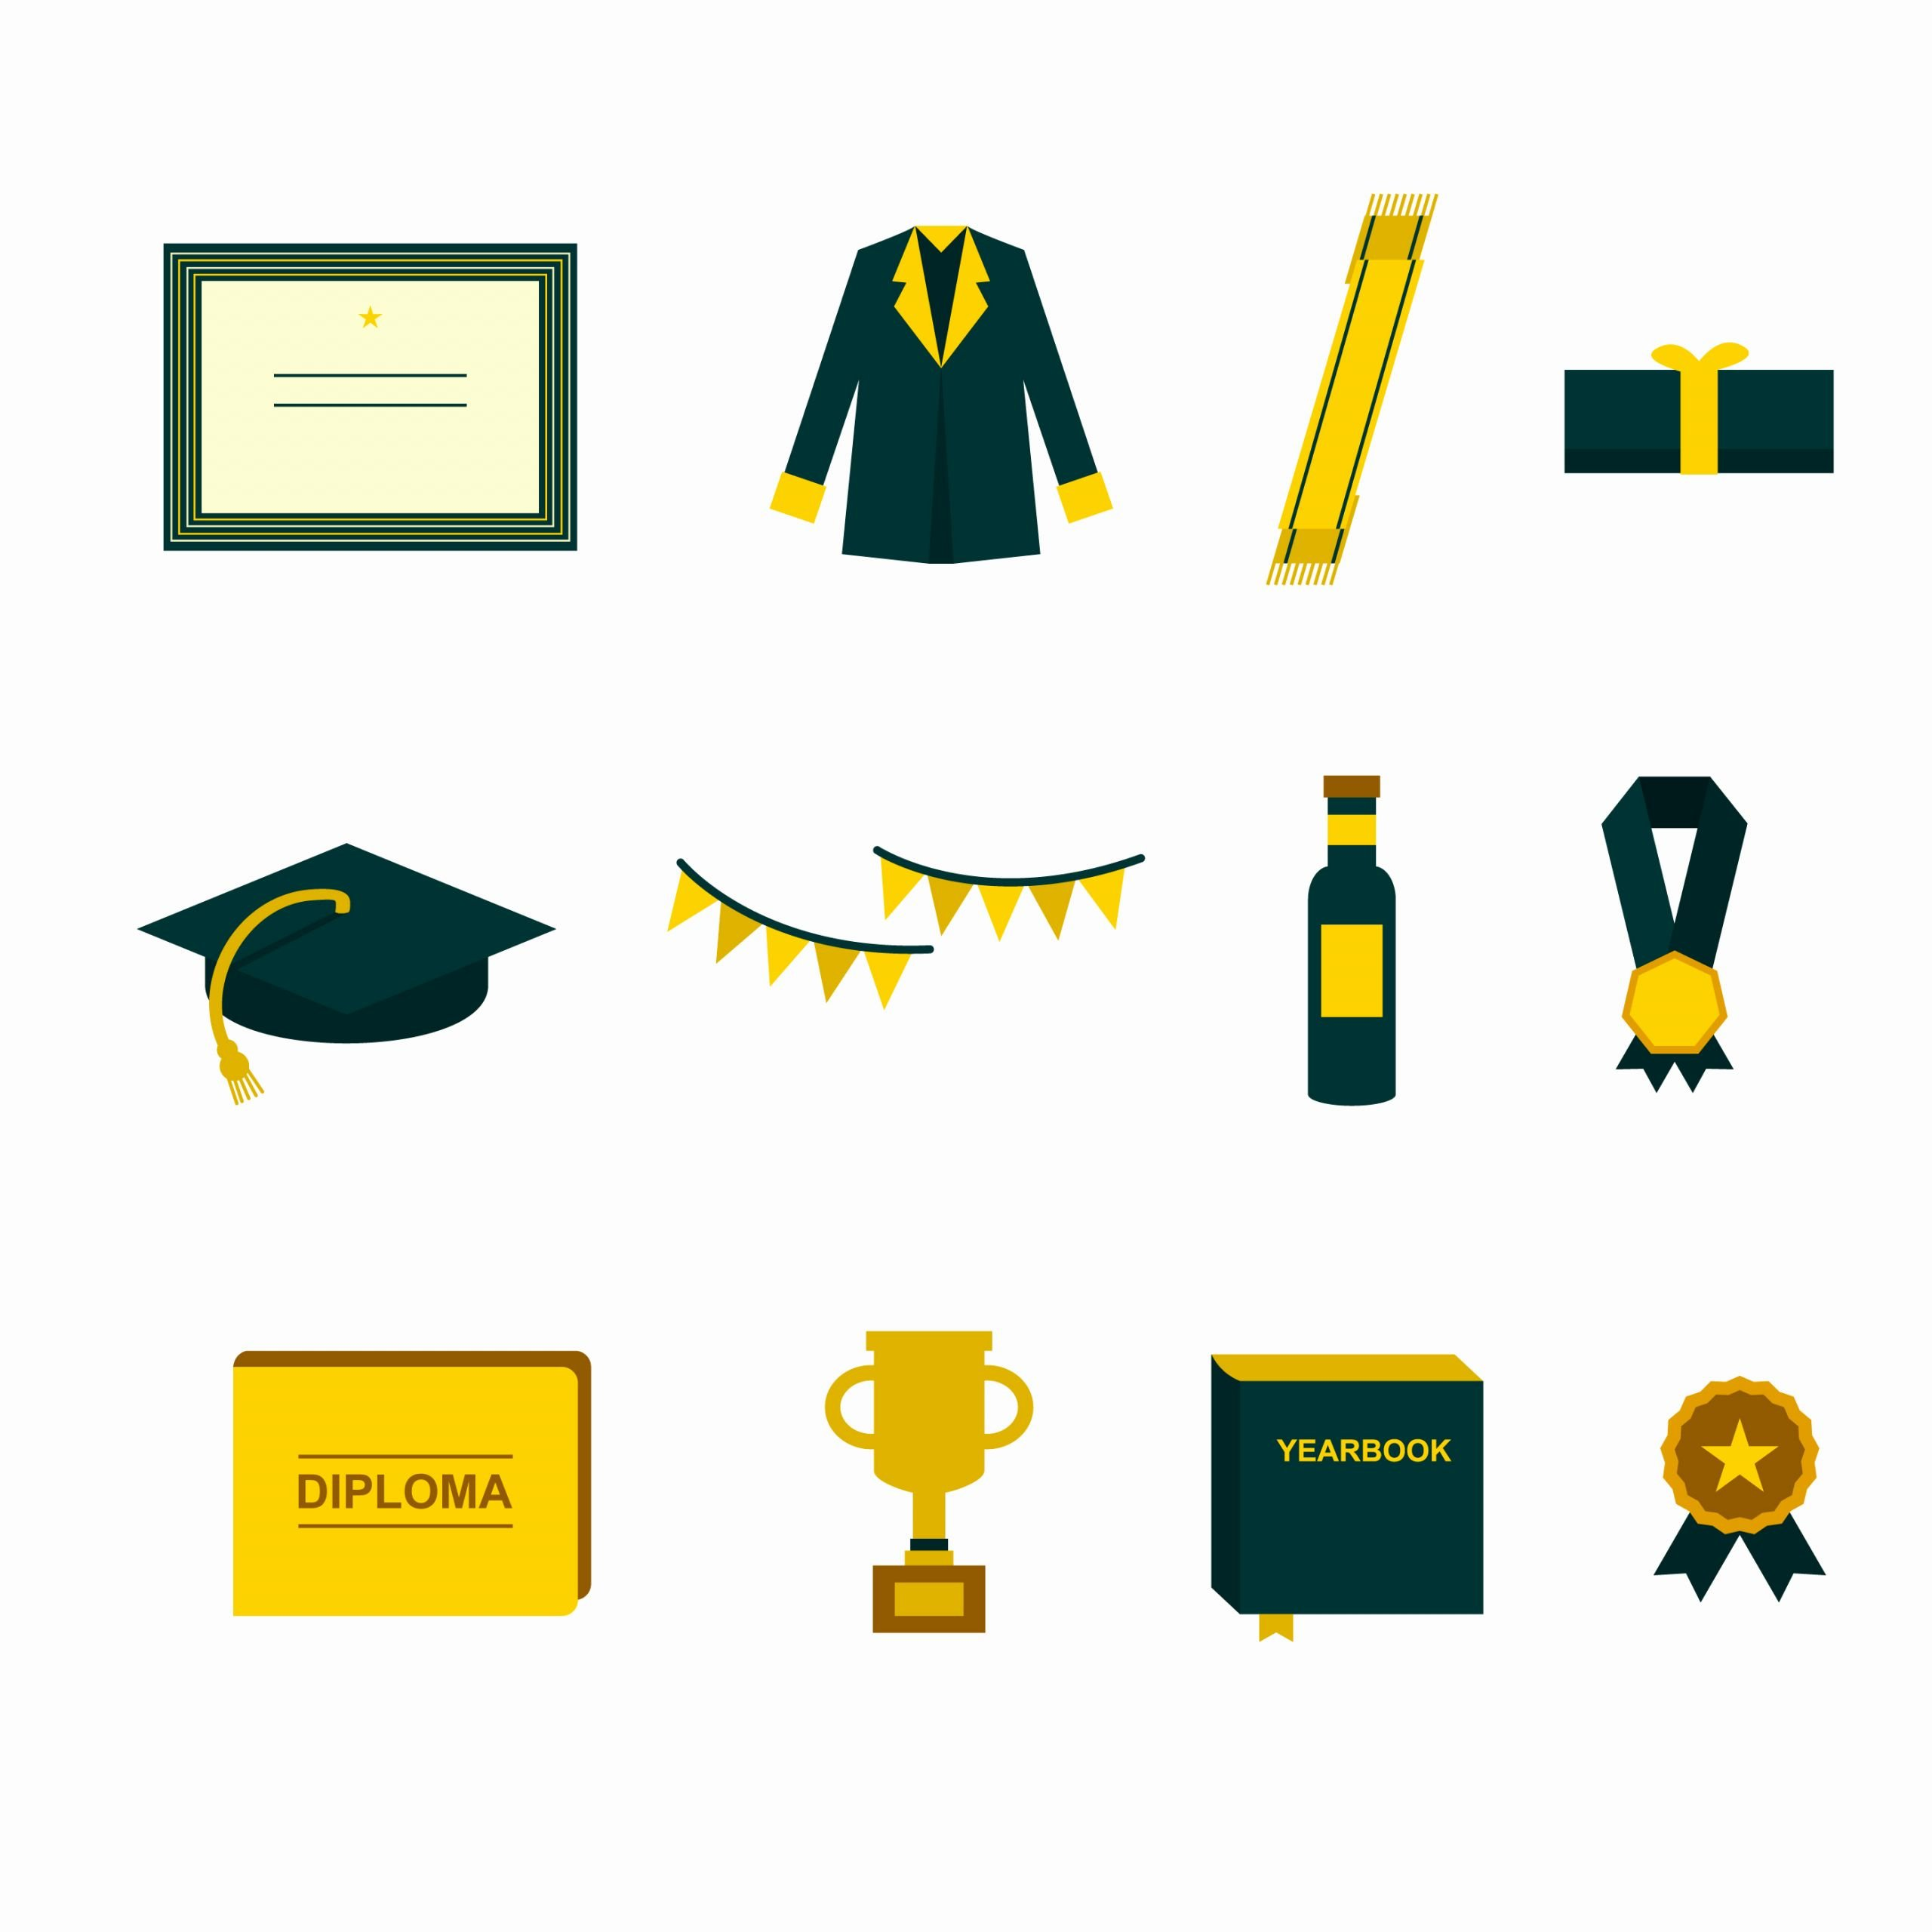 Graduation Borders and Backgrounds Unique Graduation Border Free Vector Art 7755 Free Downloads